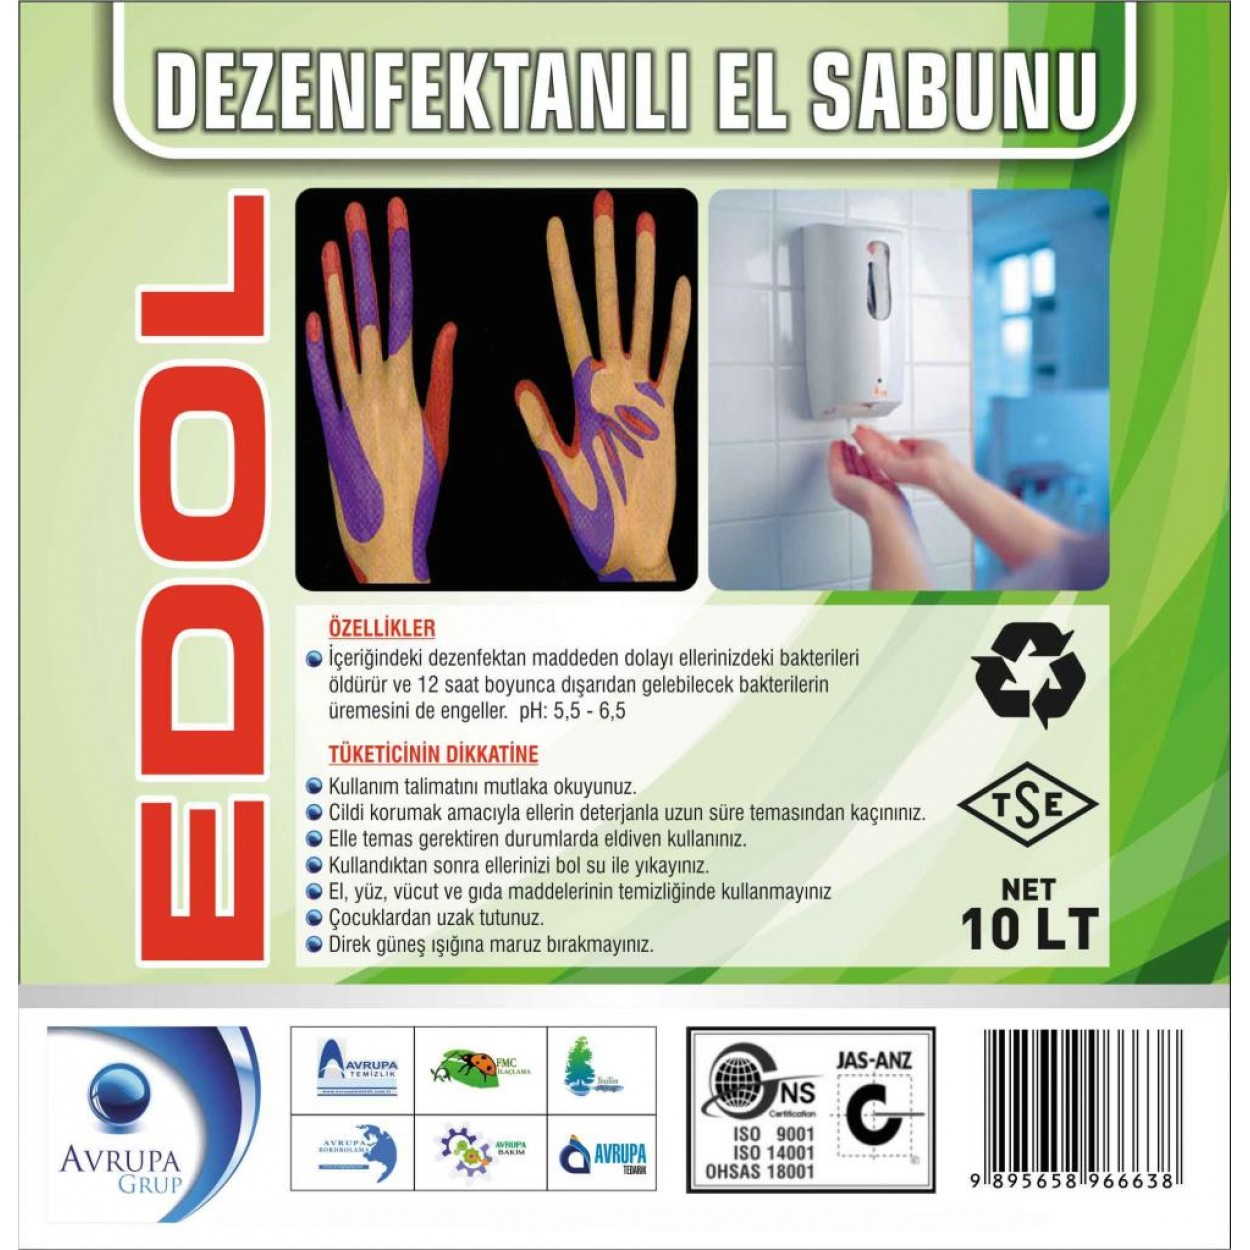 EDOL Dezenfekatnlı Sıvı El Sabunu 10 Litre